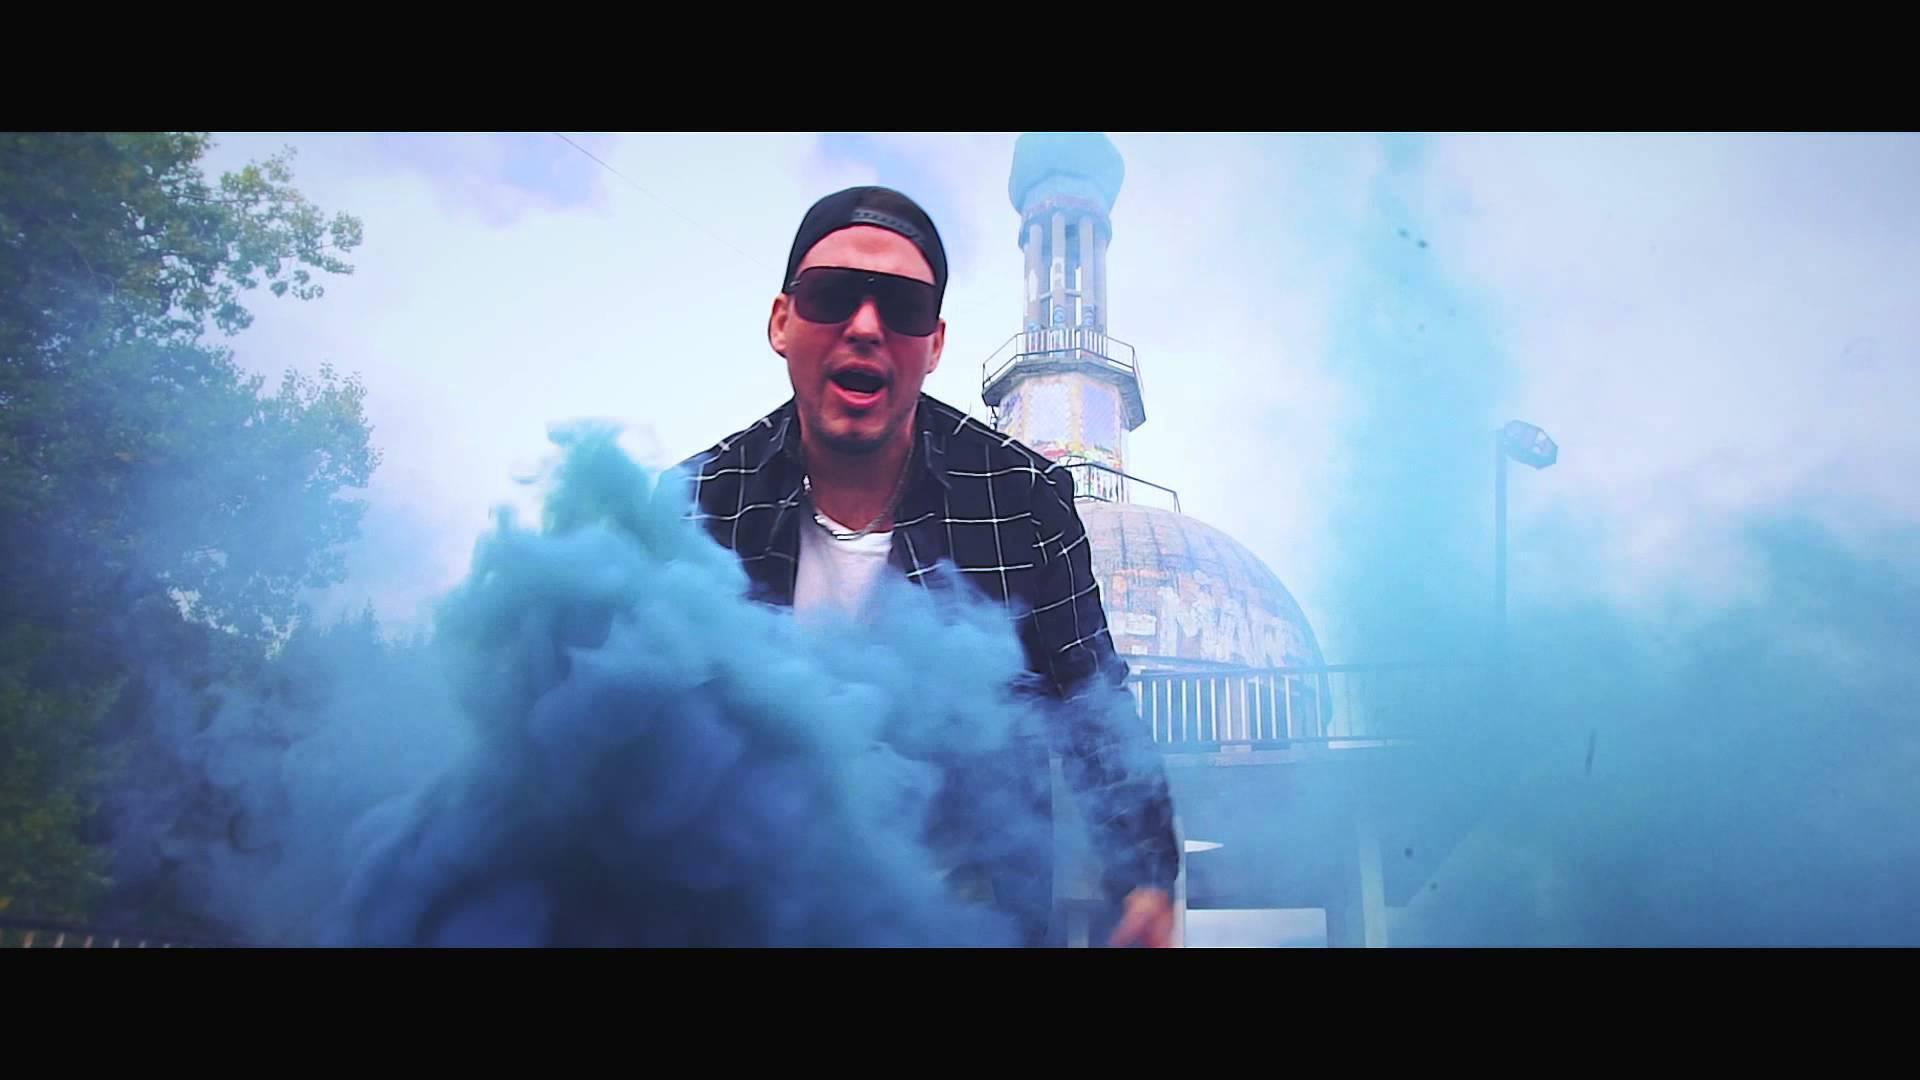 KG Man - Dancehall Crazy Body [10/14/2015]